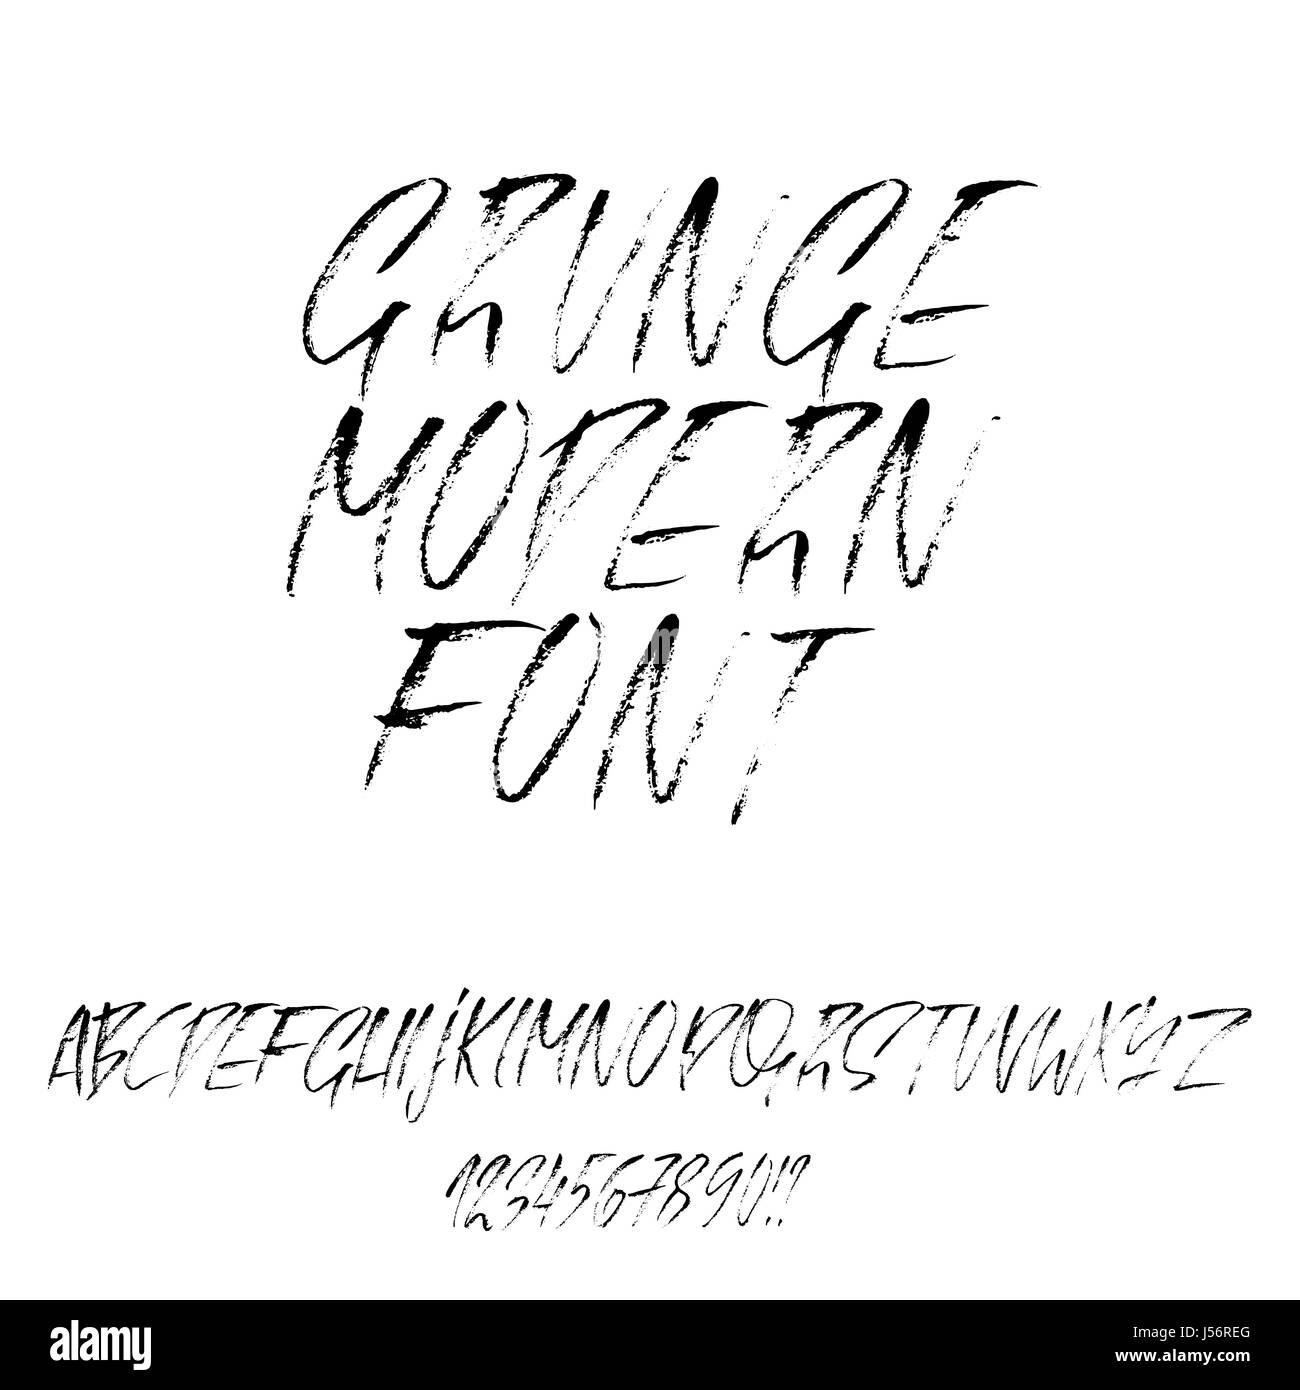 Graffiti Font Alphabet Stock Photos & Graffiti Font Alphabet